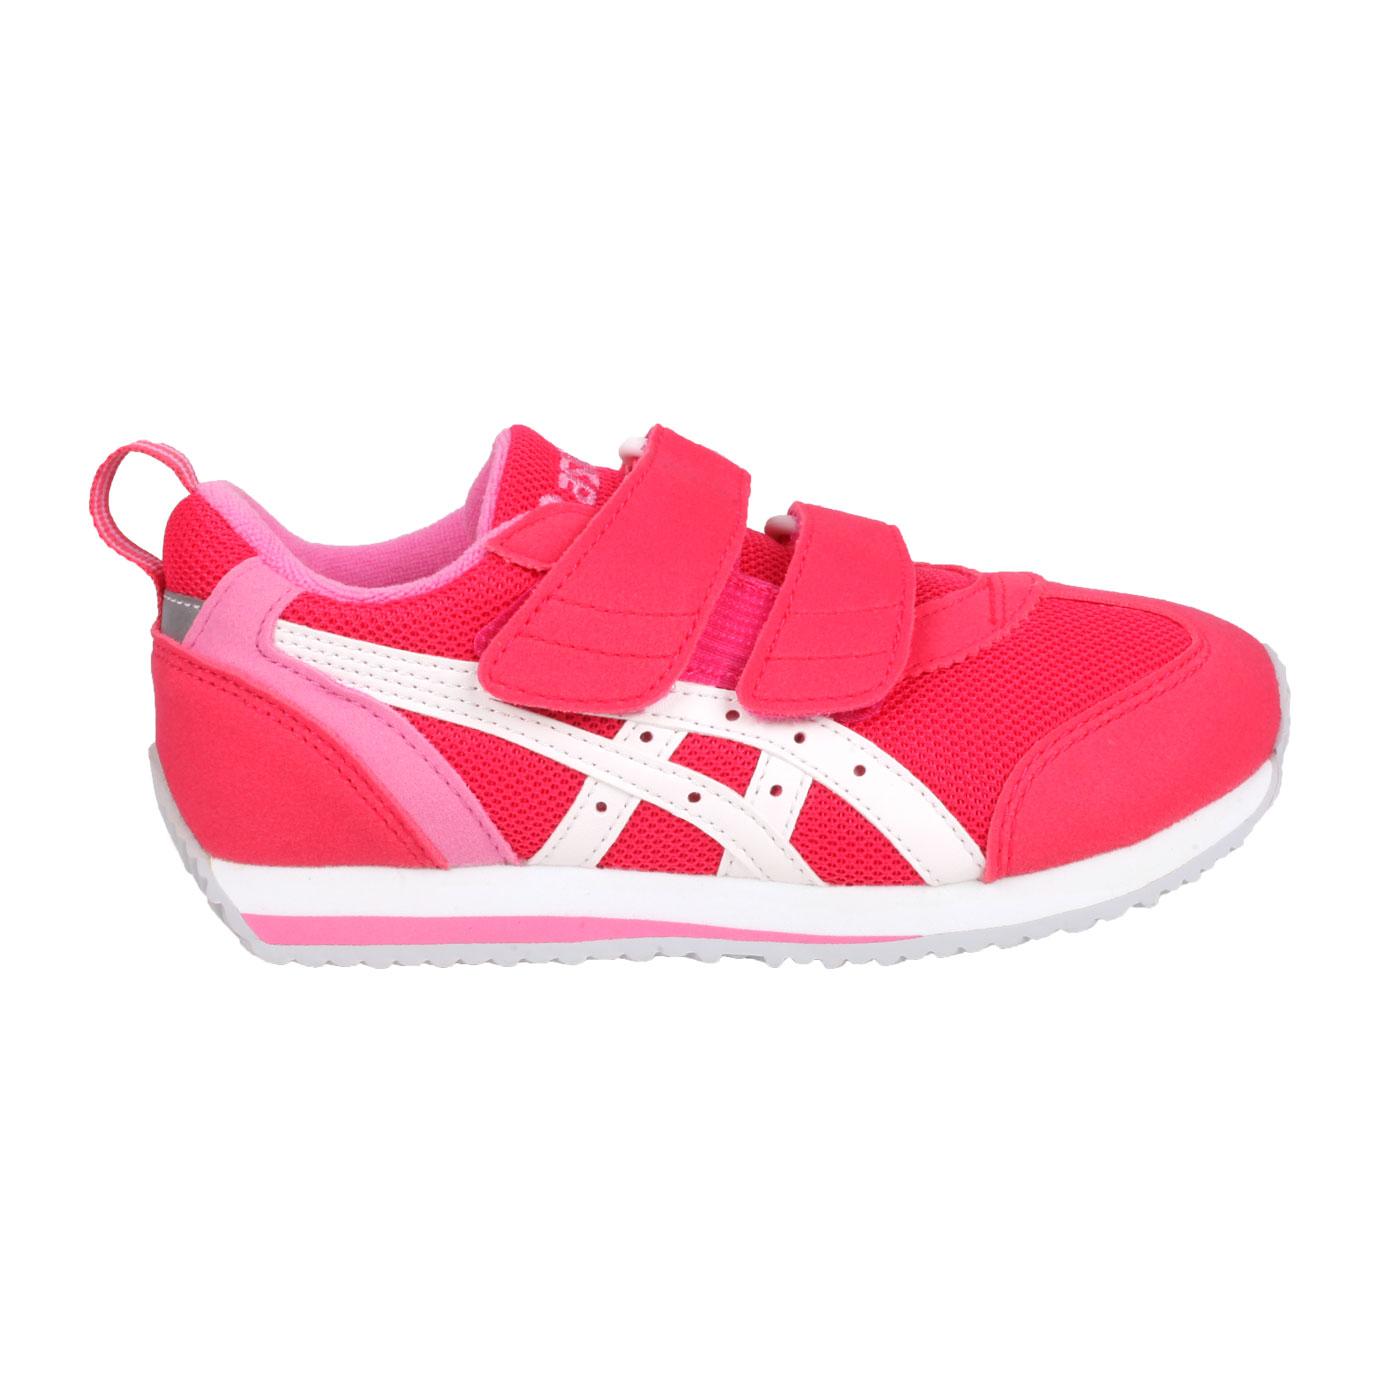 ASICS 小童運動鞋  @IDAHO MINI 3@TUM186-1901 - 玫紅白